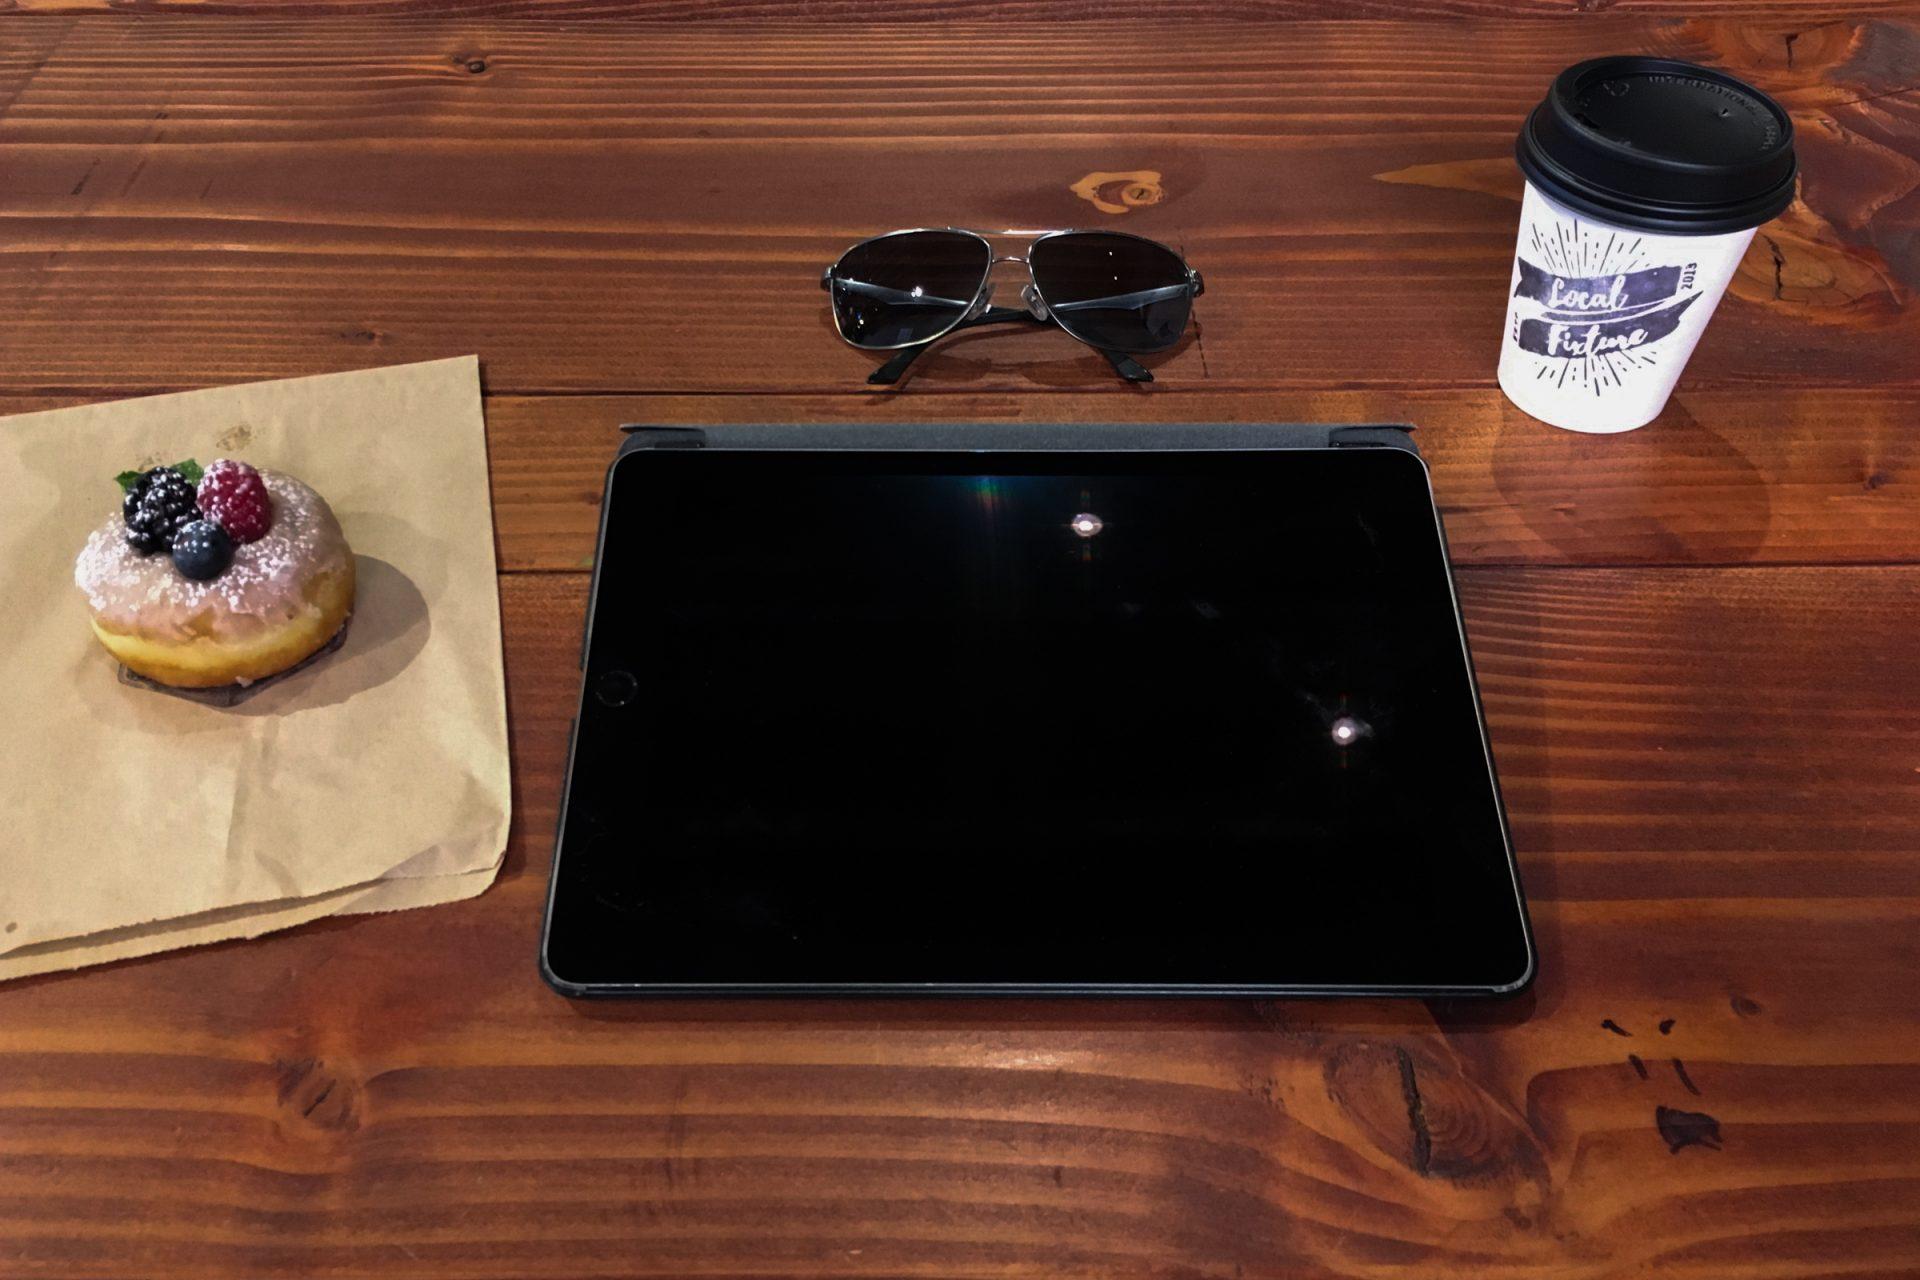 iPad & Coffee on Wood Table